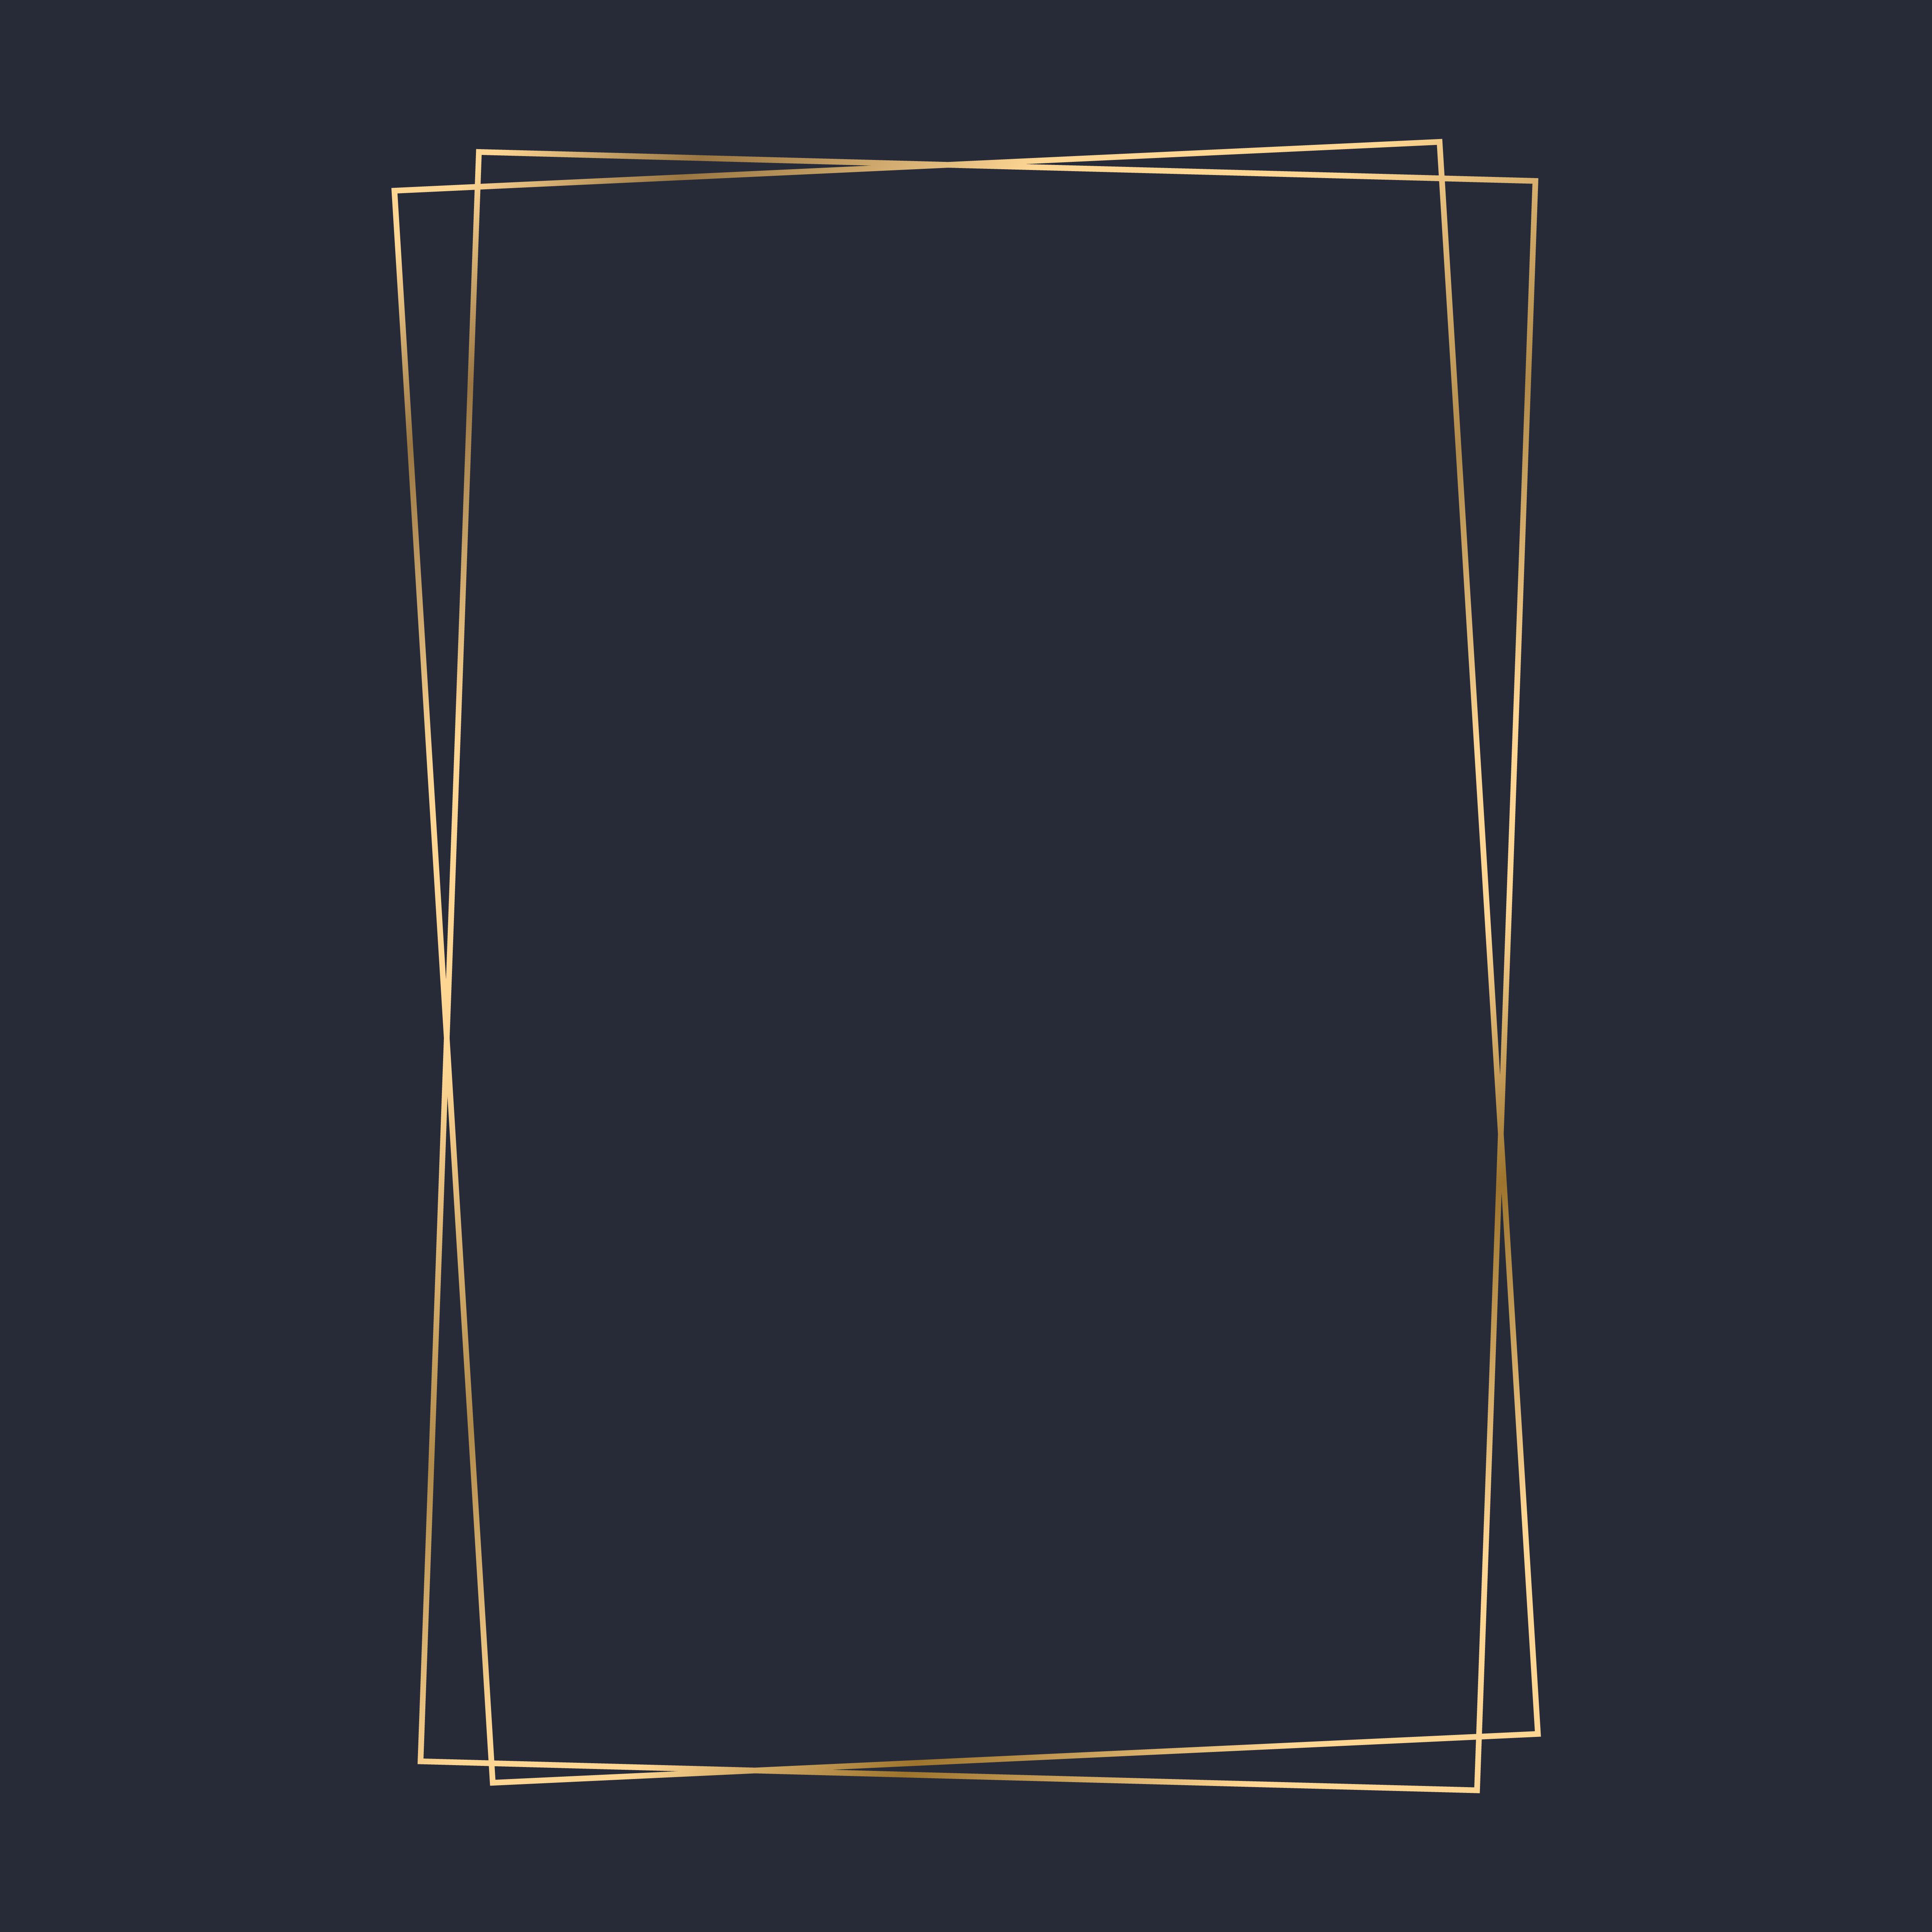 Golden Rectangle Frame Template Vector